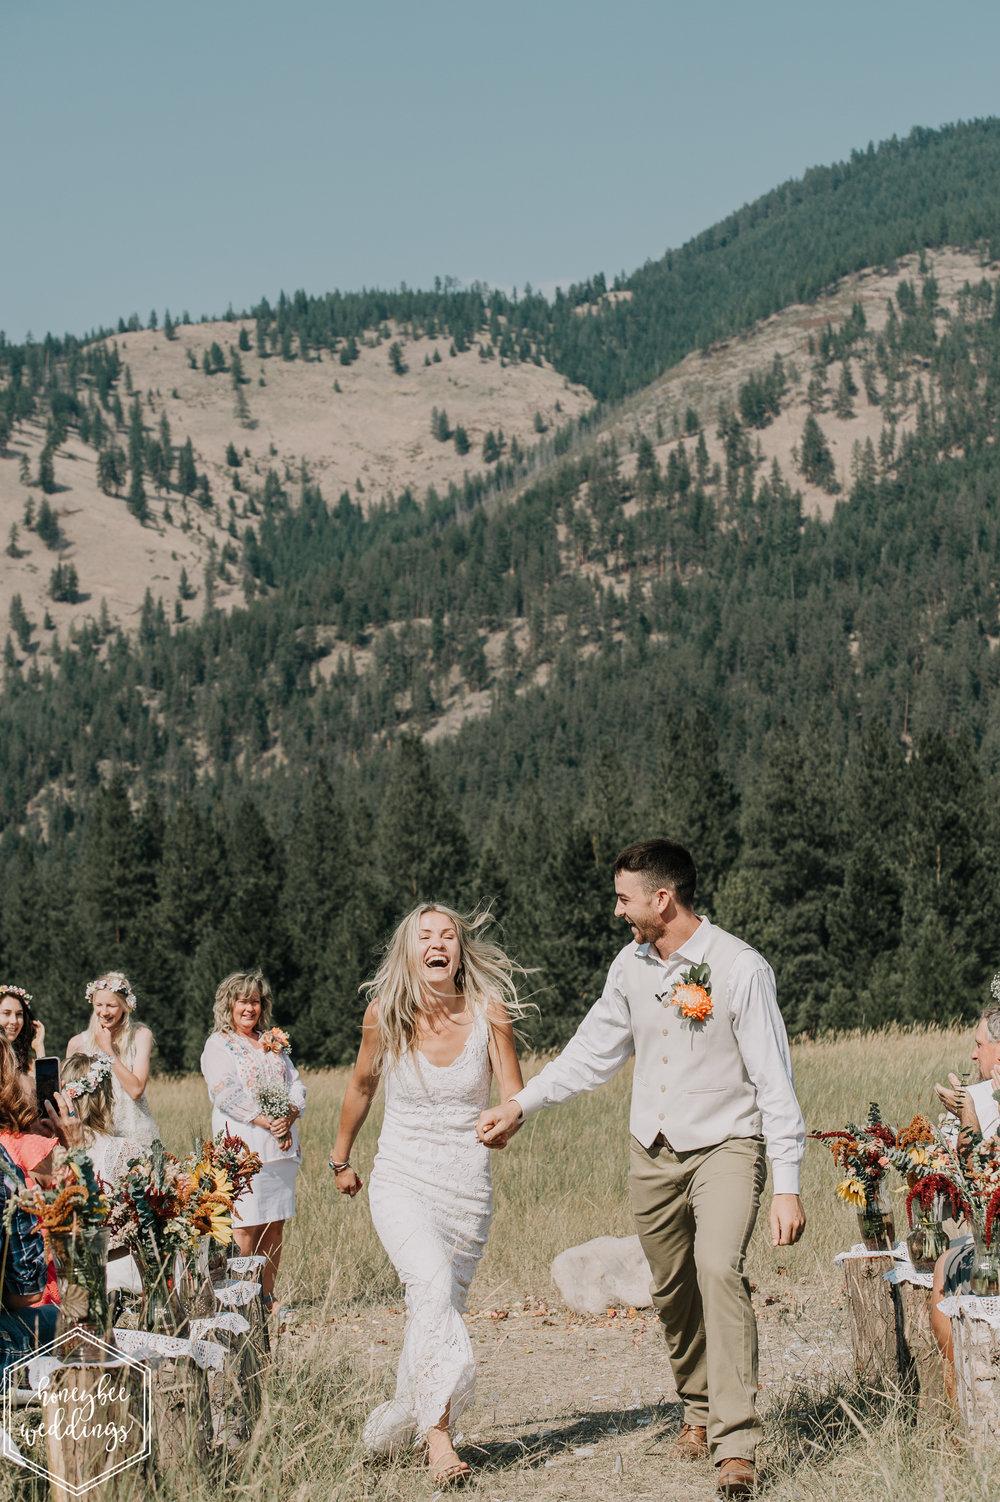 0394Alberton Wedding_Montana Wedding Photographer_Anneliesa Bashaw + Wyatt Zeylawy_August 11, 2018-313.jpg